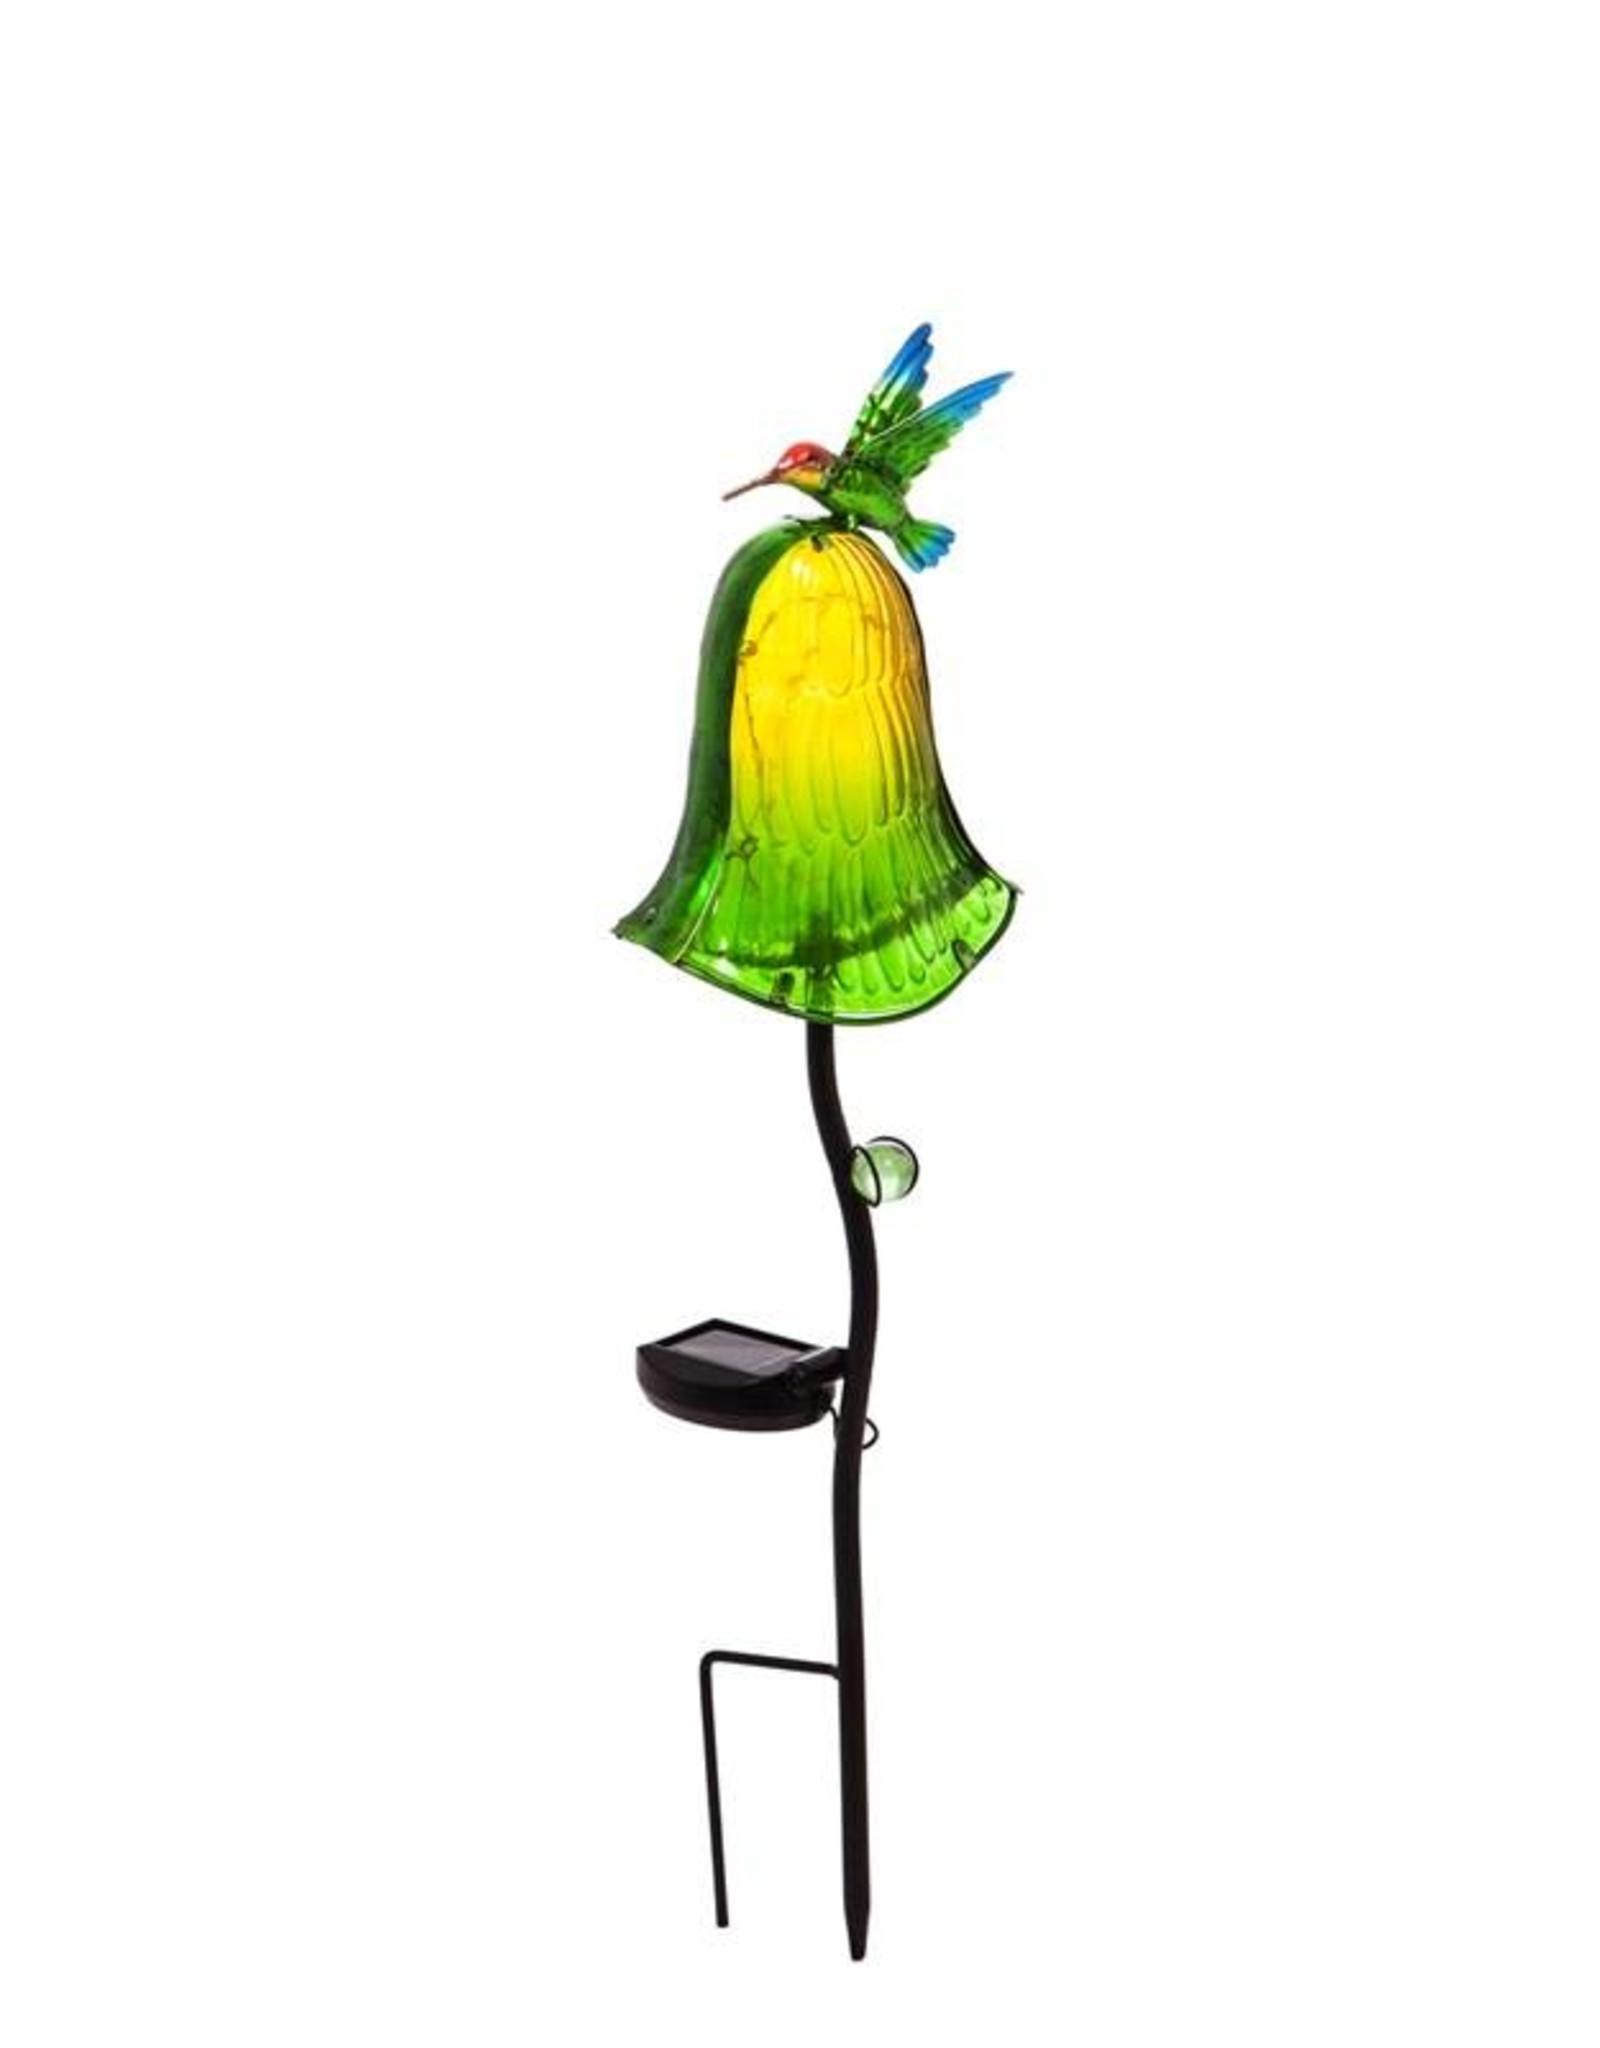 Glass Mushroom Solar Stake - Green Bird